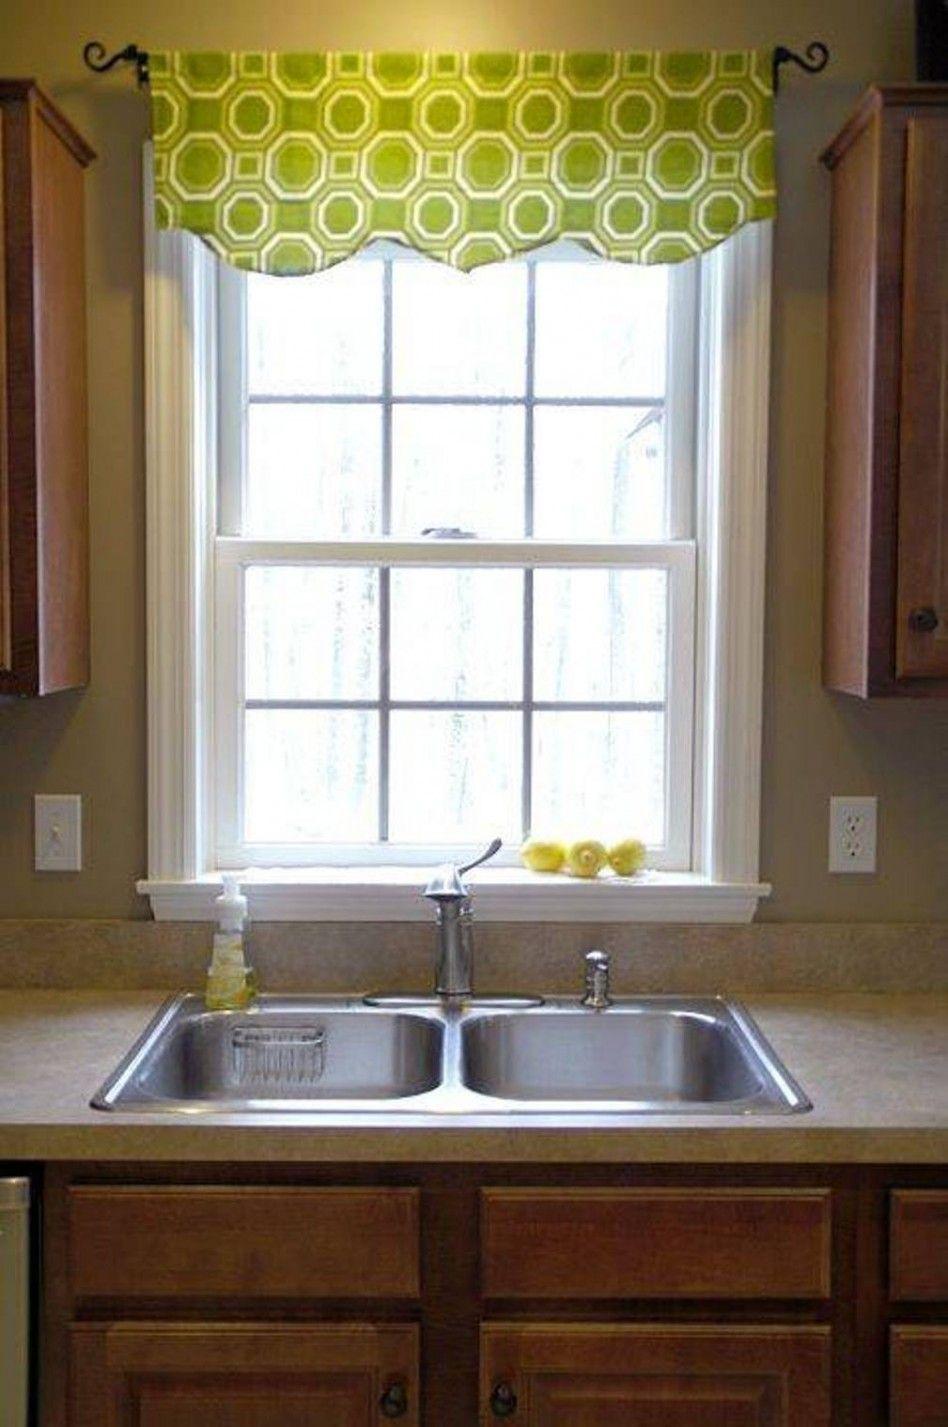 Kitchen window treatment ideas  decorations simple cotton green octagon pattern kitchen valances